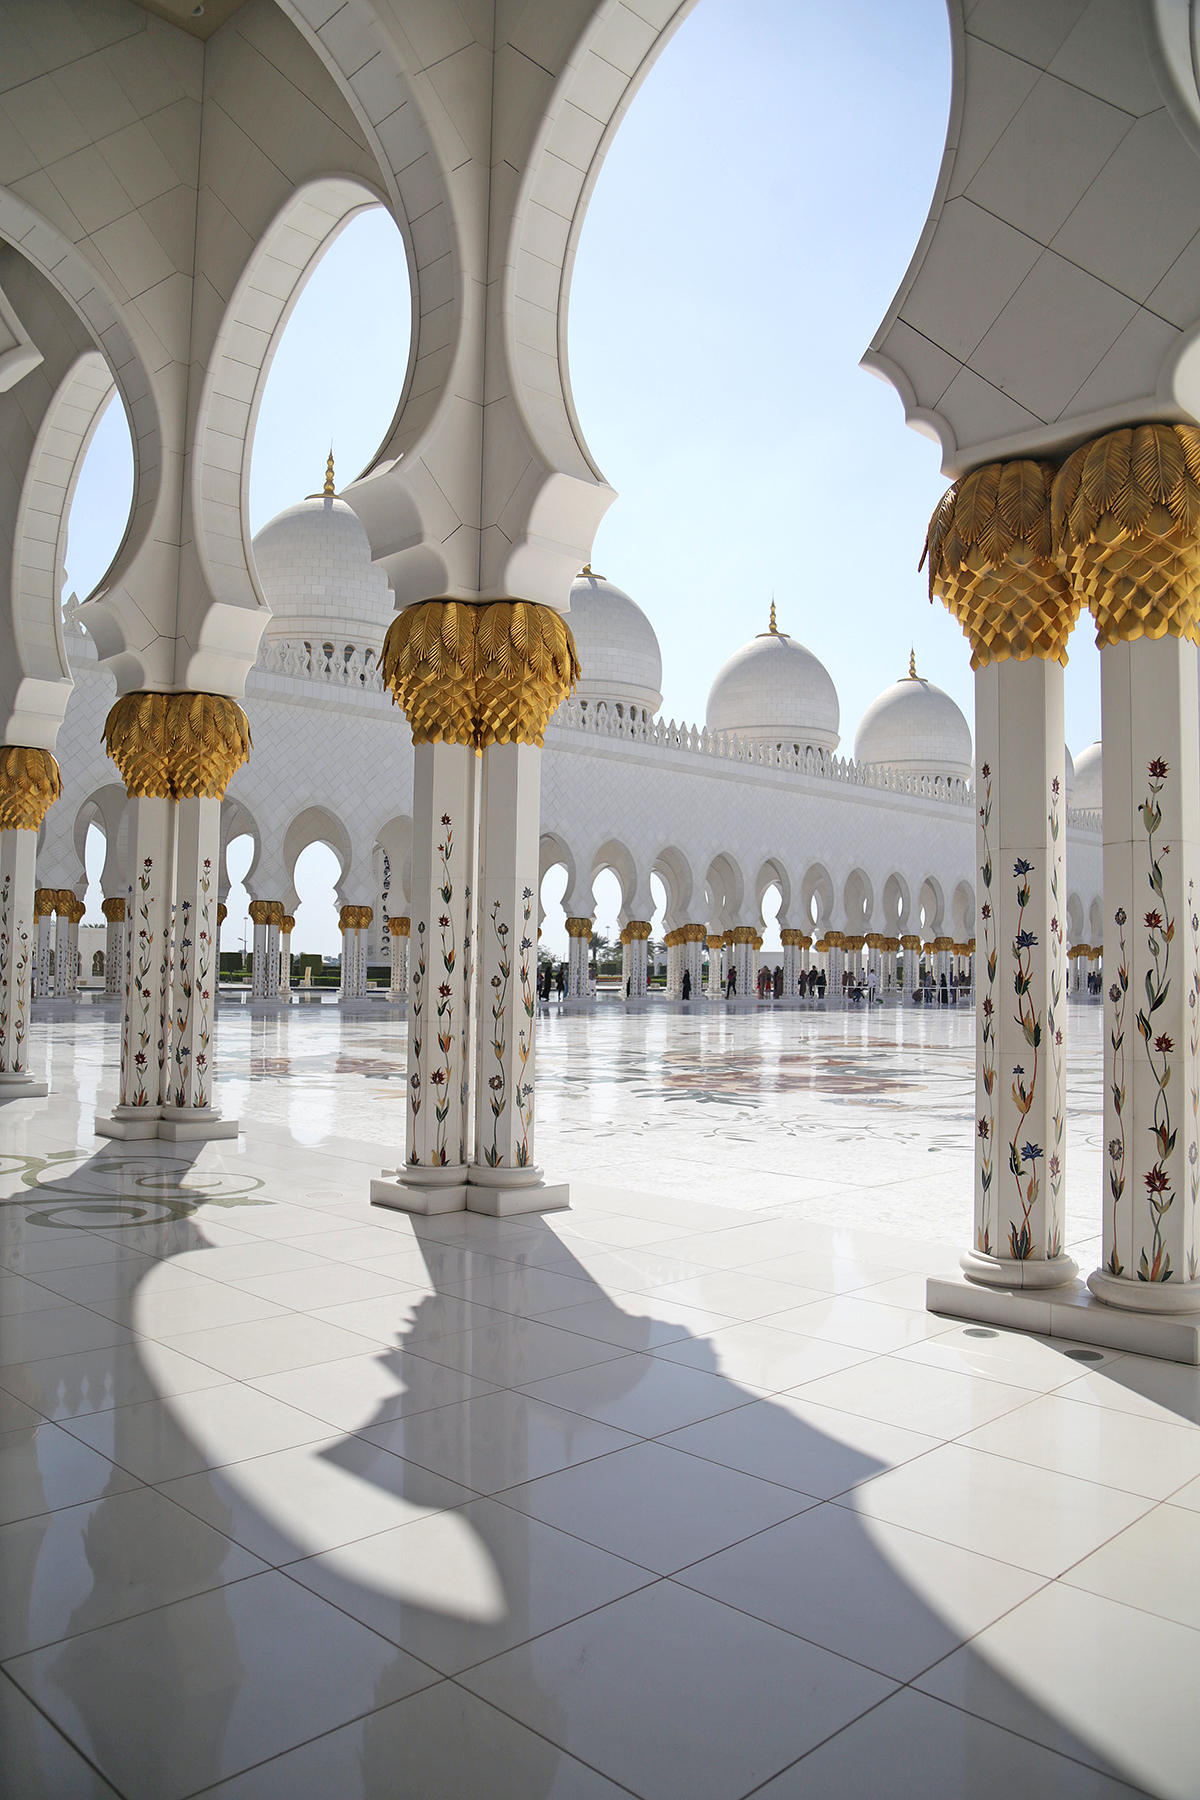 mosquée Cheikh Zayed Abu Dhabi design